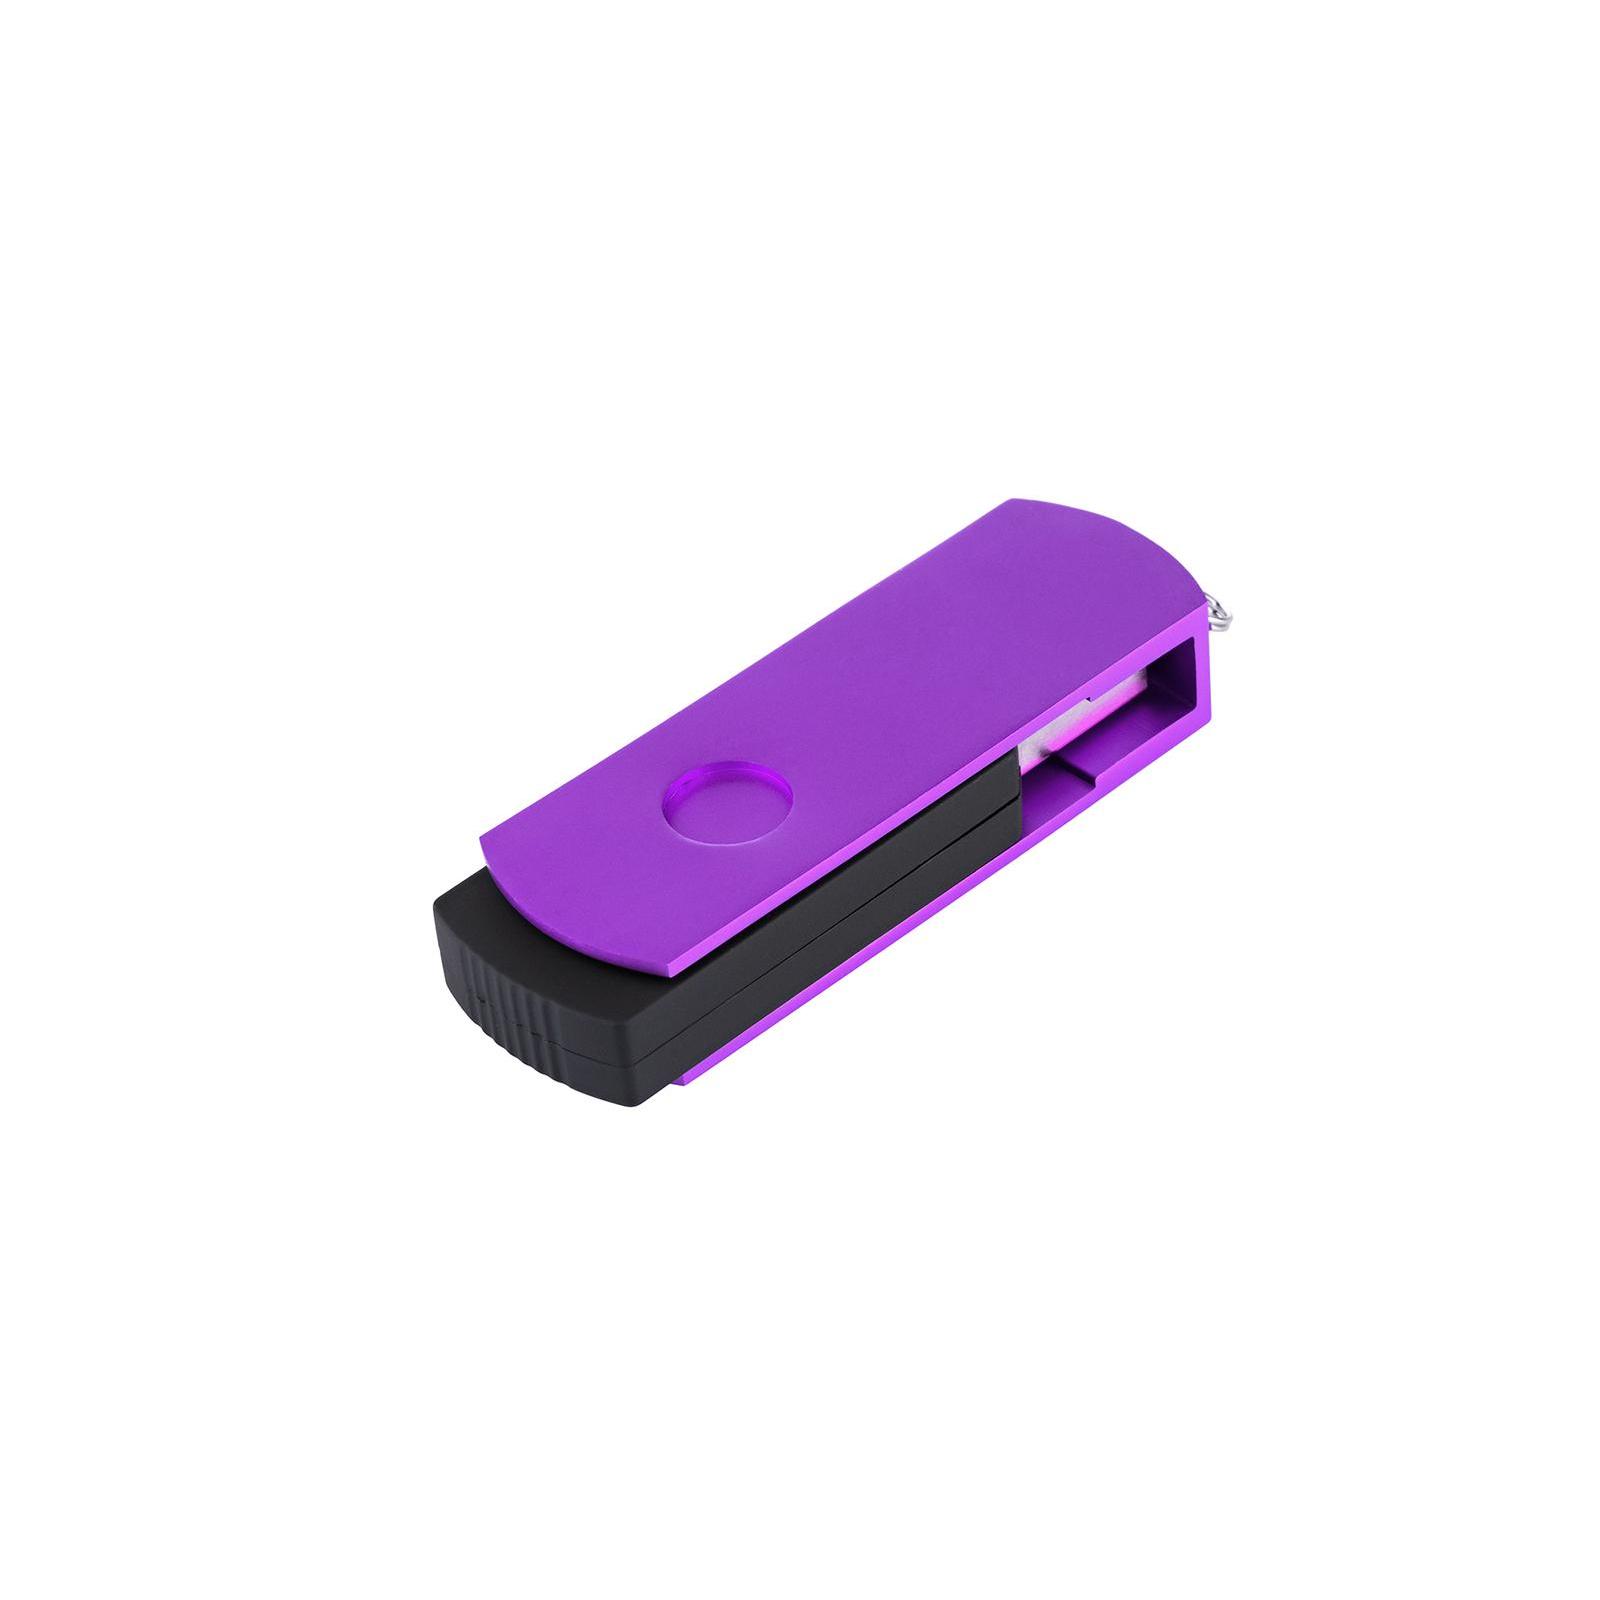 USB флеш накопитель eXceleram 16GB P2 Series Brown/Black USB 3.1 Gen 1 (EXP2U3BRB16) изображение 6